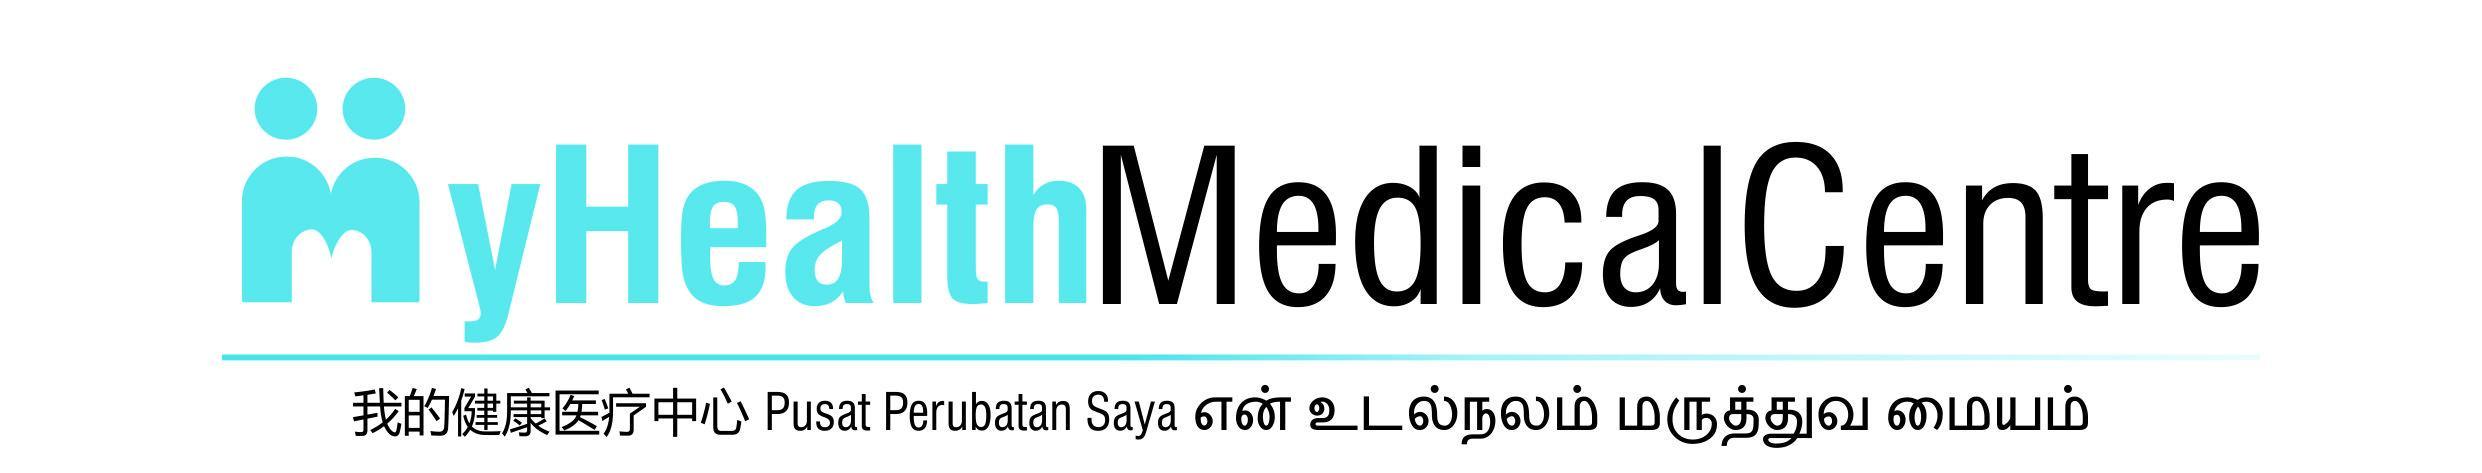 MyHealth Medical Centre